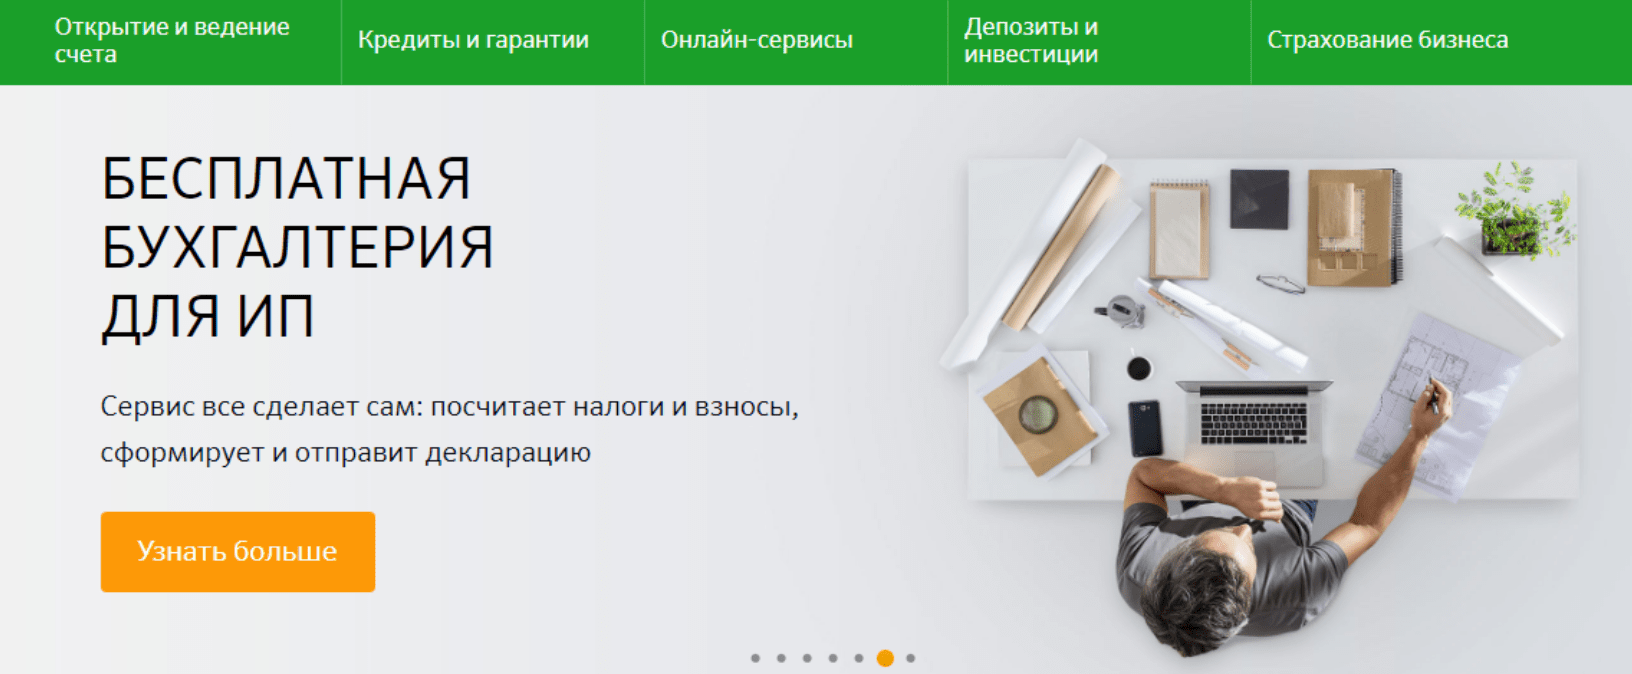 Функции интернет банка